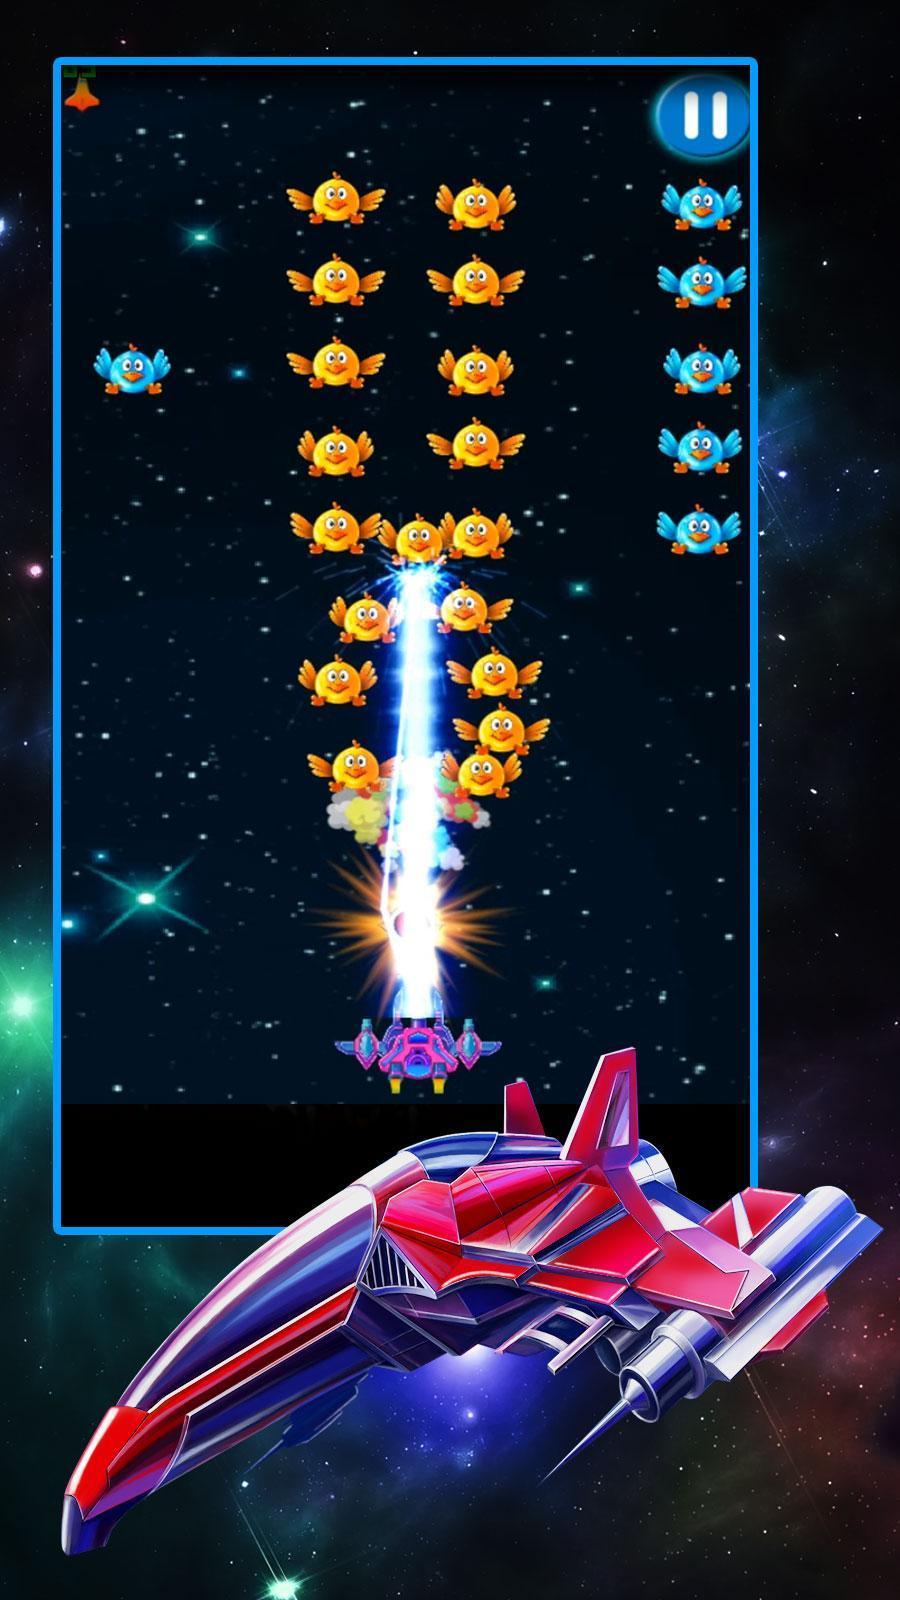 Chicken Shooter Galaxy Attack 2.8 Screenshot 4